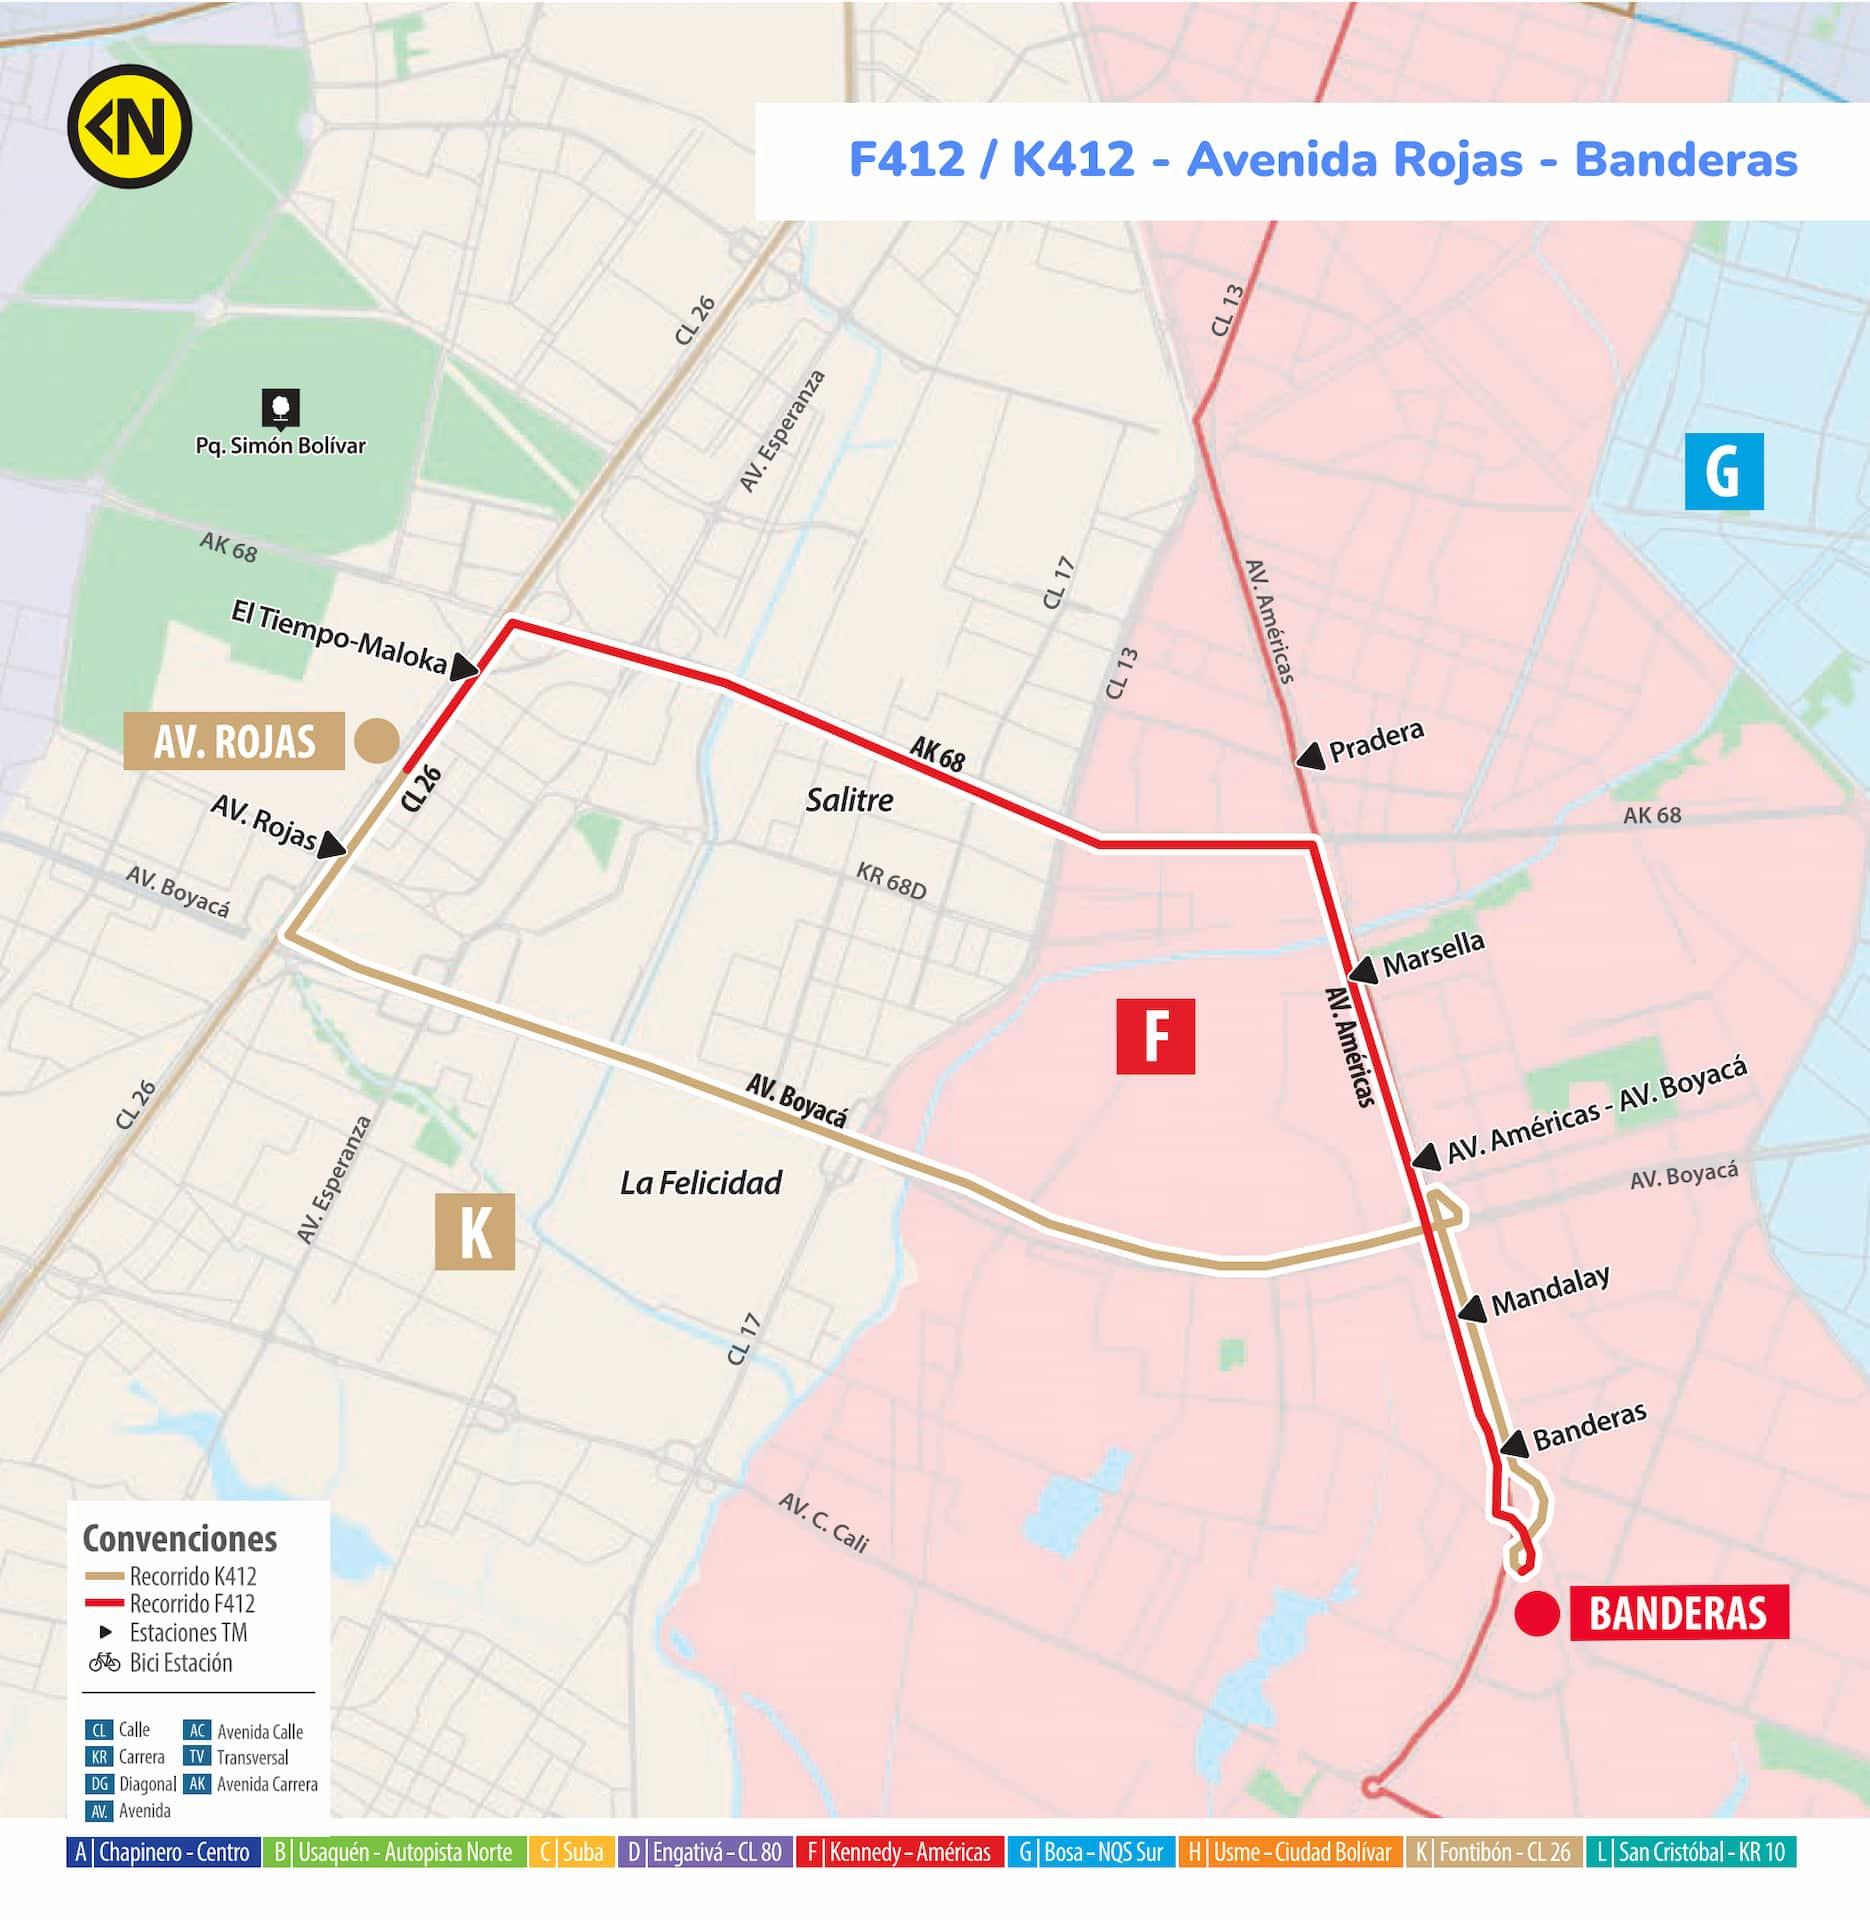 Mapa Ruta SITP F412-K412 - Avenida Rojas - Banderas, Urbana